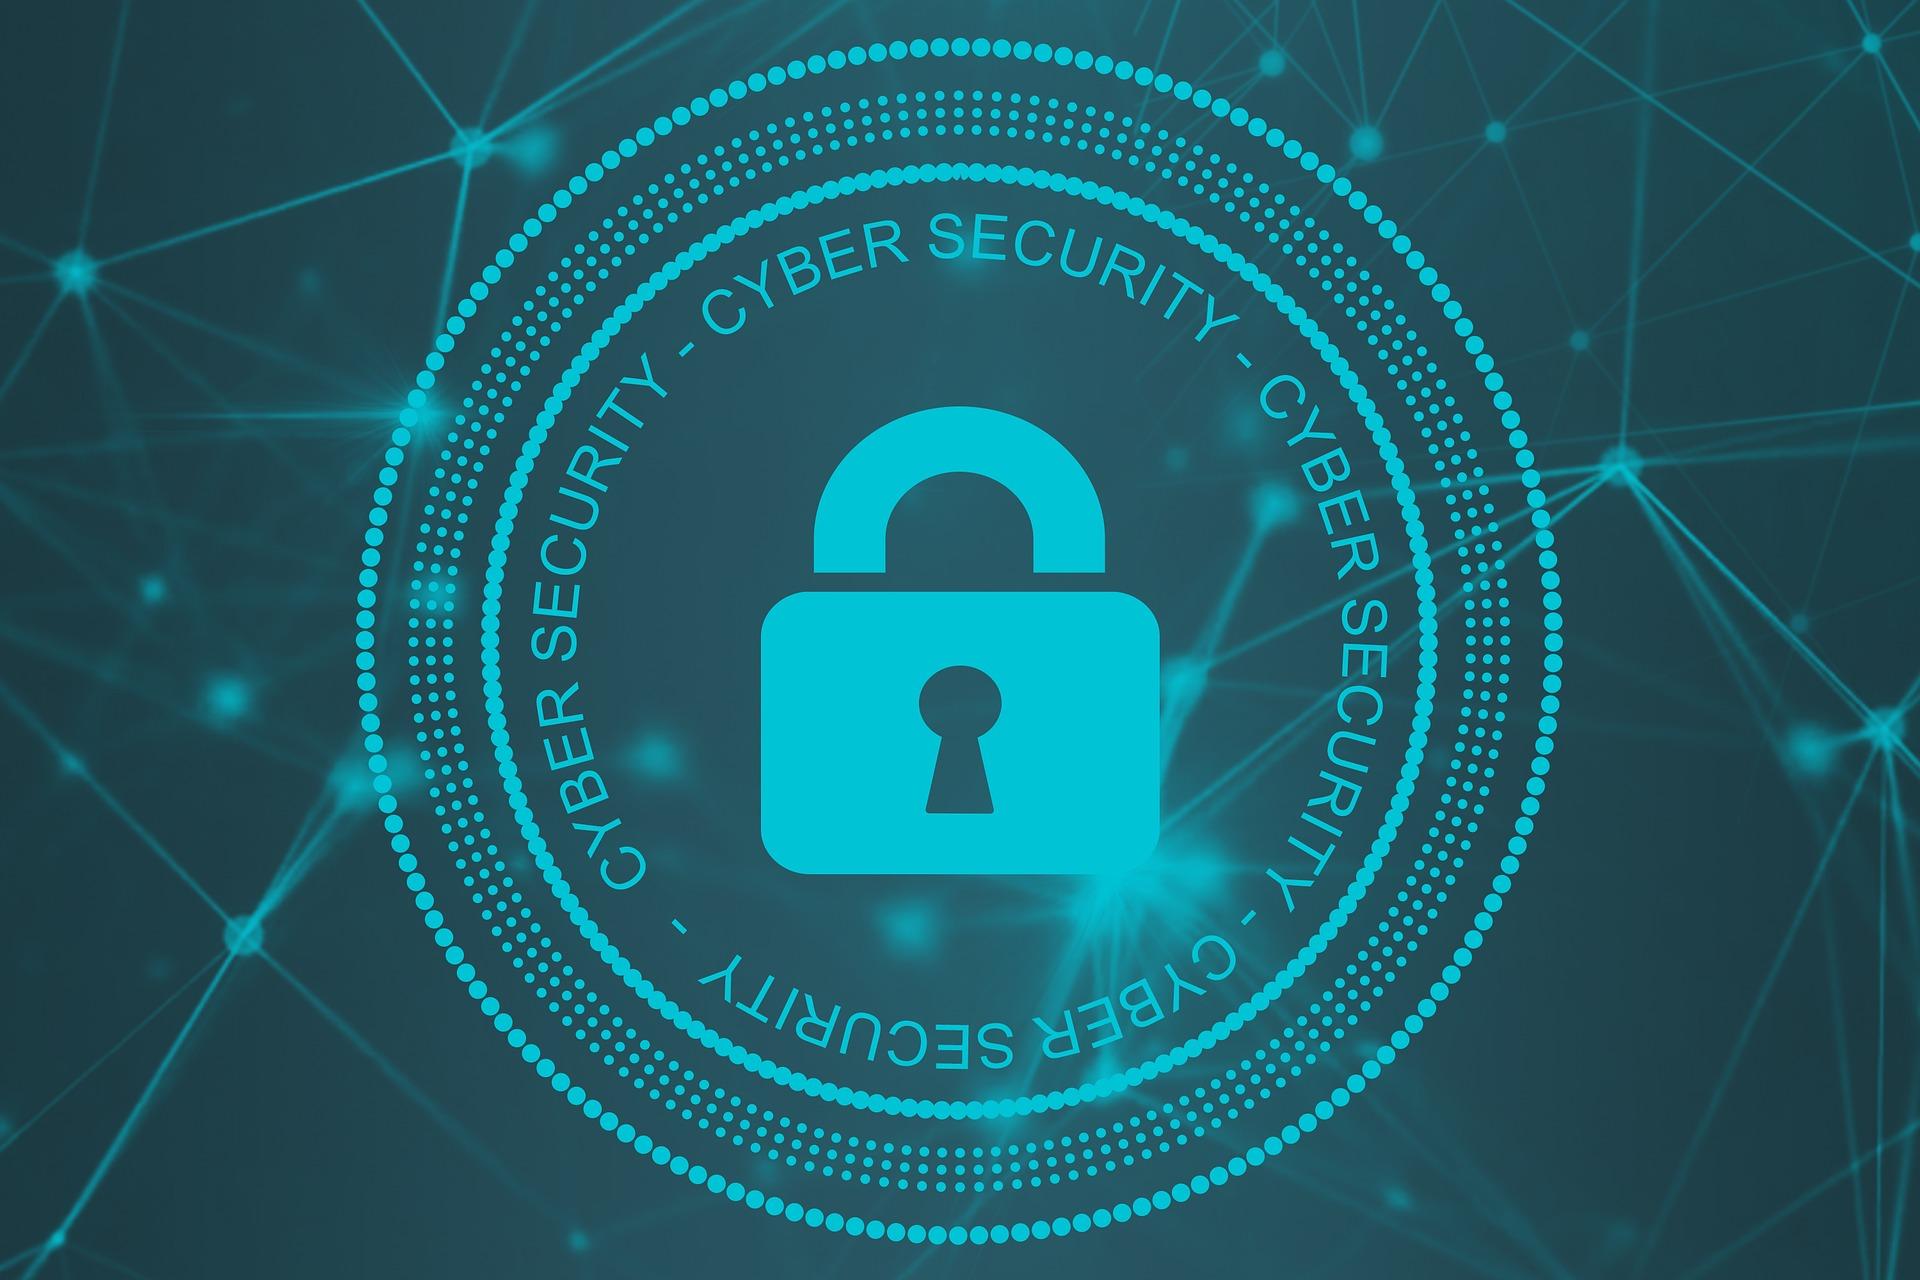 Dutch Cyber Security Assessment 2019 Key Takeaways